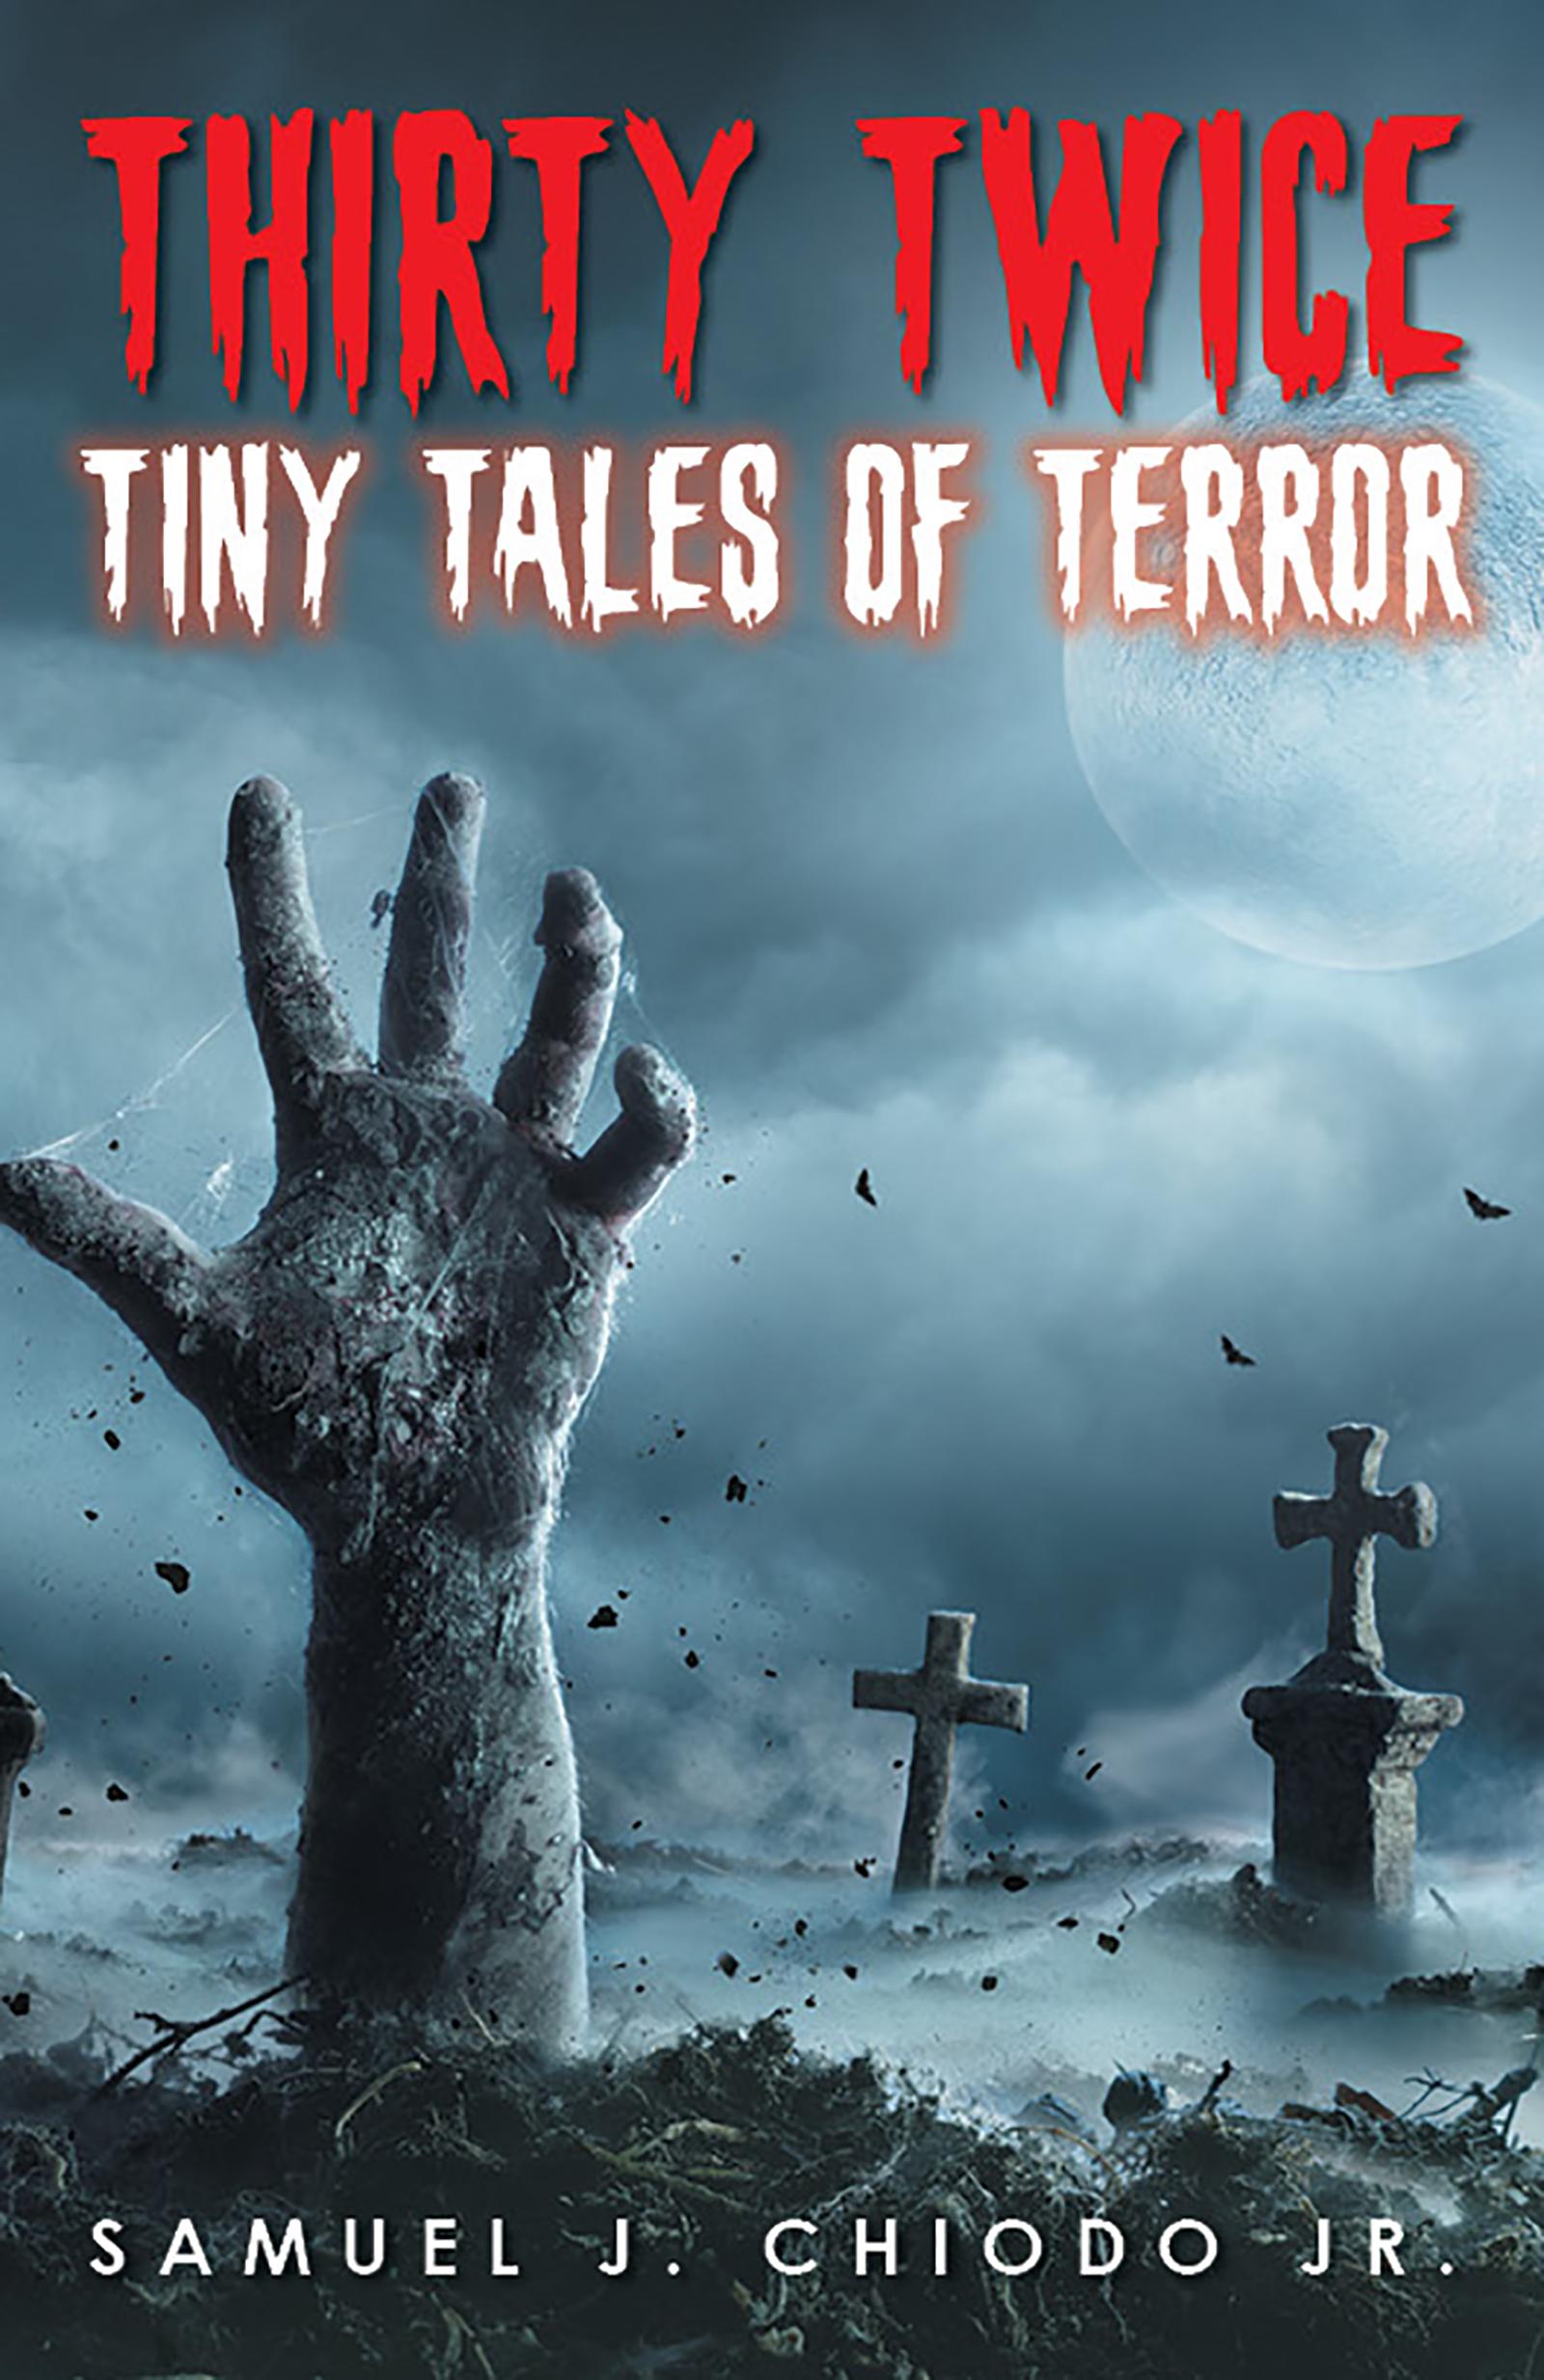 Thirty Twice Tiny Tales of Terror by Samuel J. Chiodo Jr.